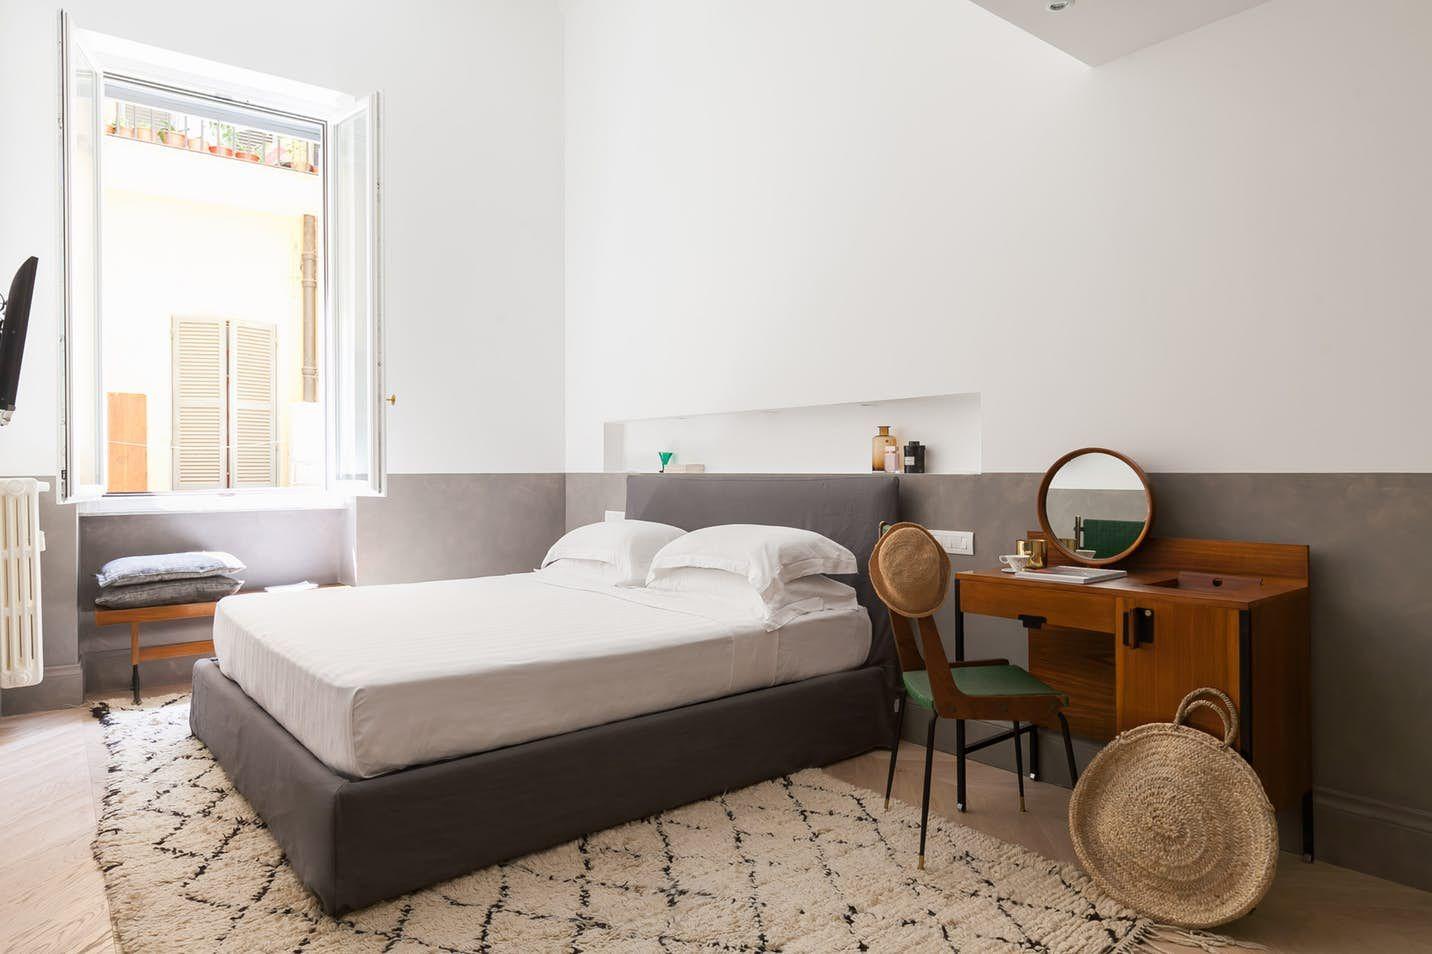 Via della Vetrina II | Vacation Apartment Rental in Navona ...